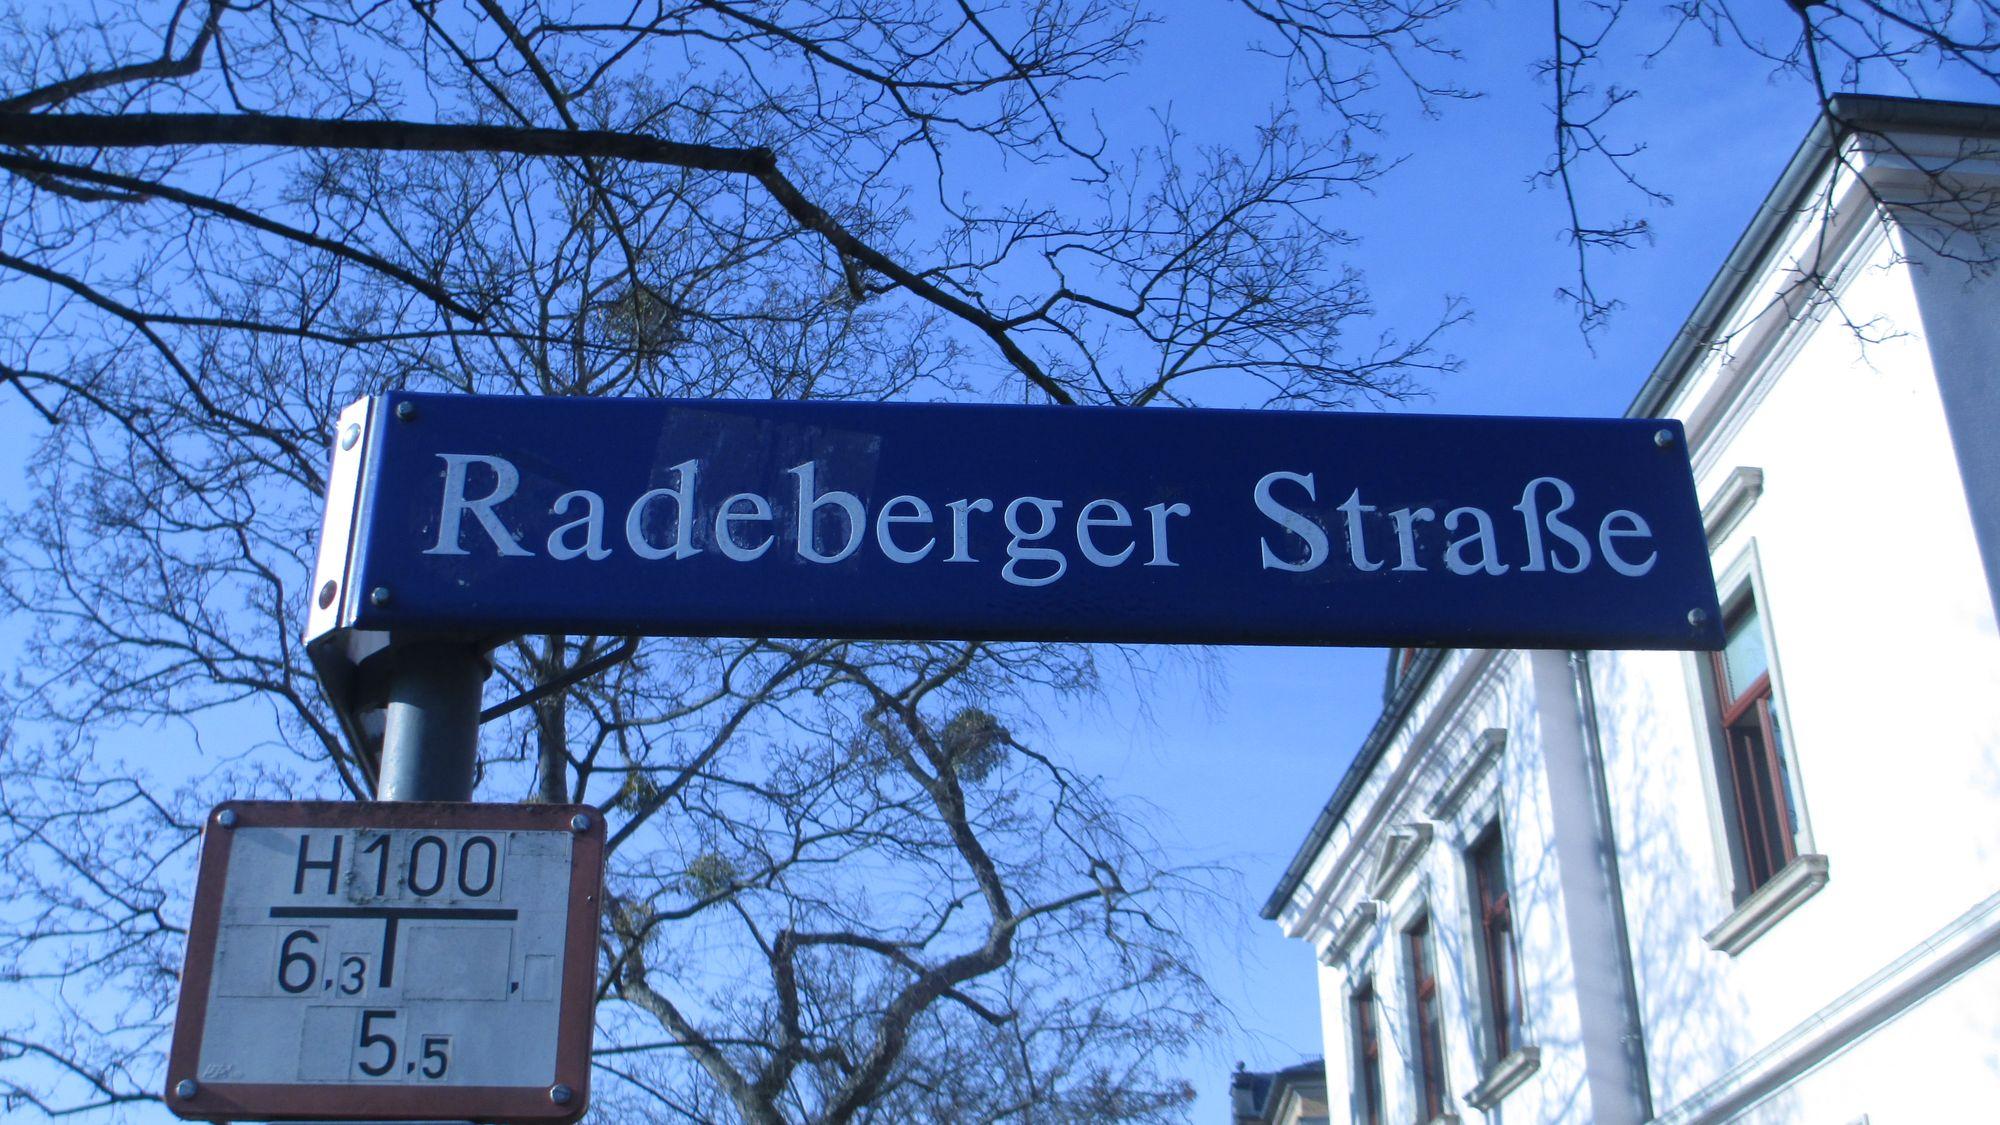 Radeberger Straße Köln